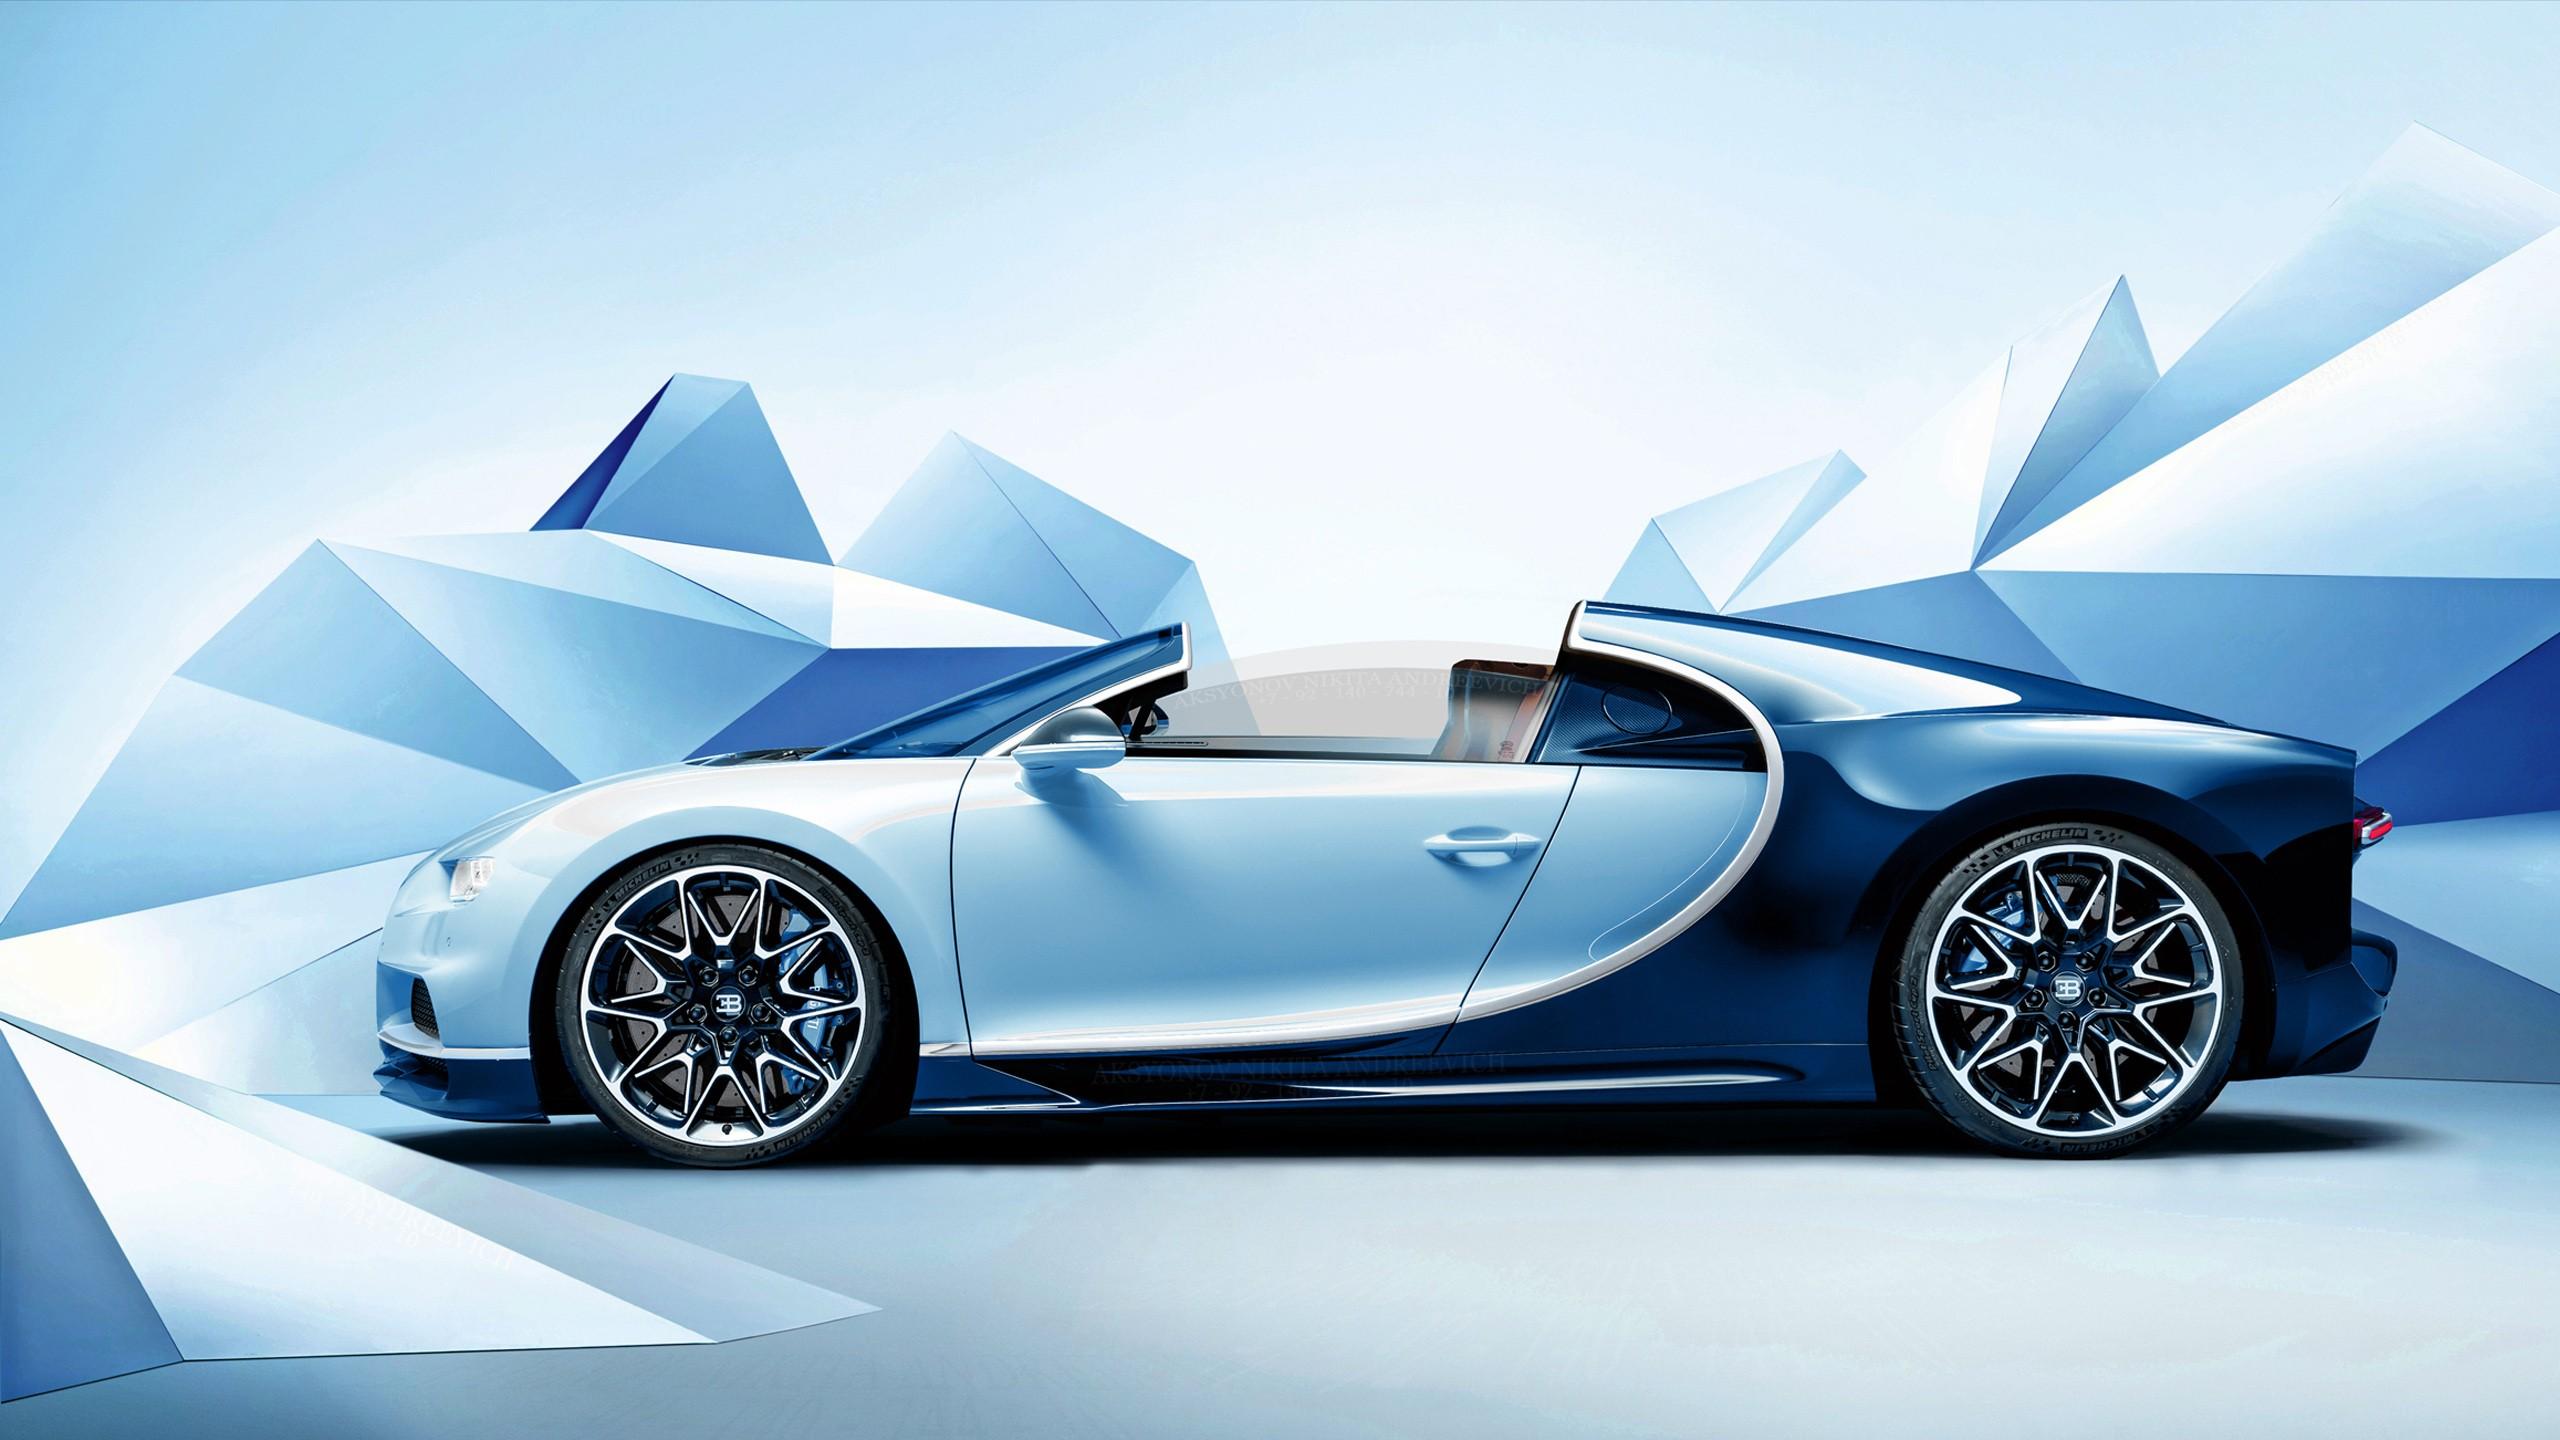 Bugatti Chiron Roadster Wallpaper   HD Car Wallpapers   ID ...